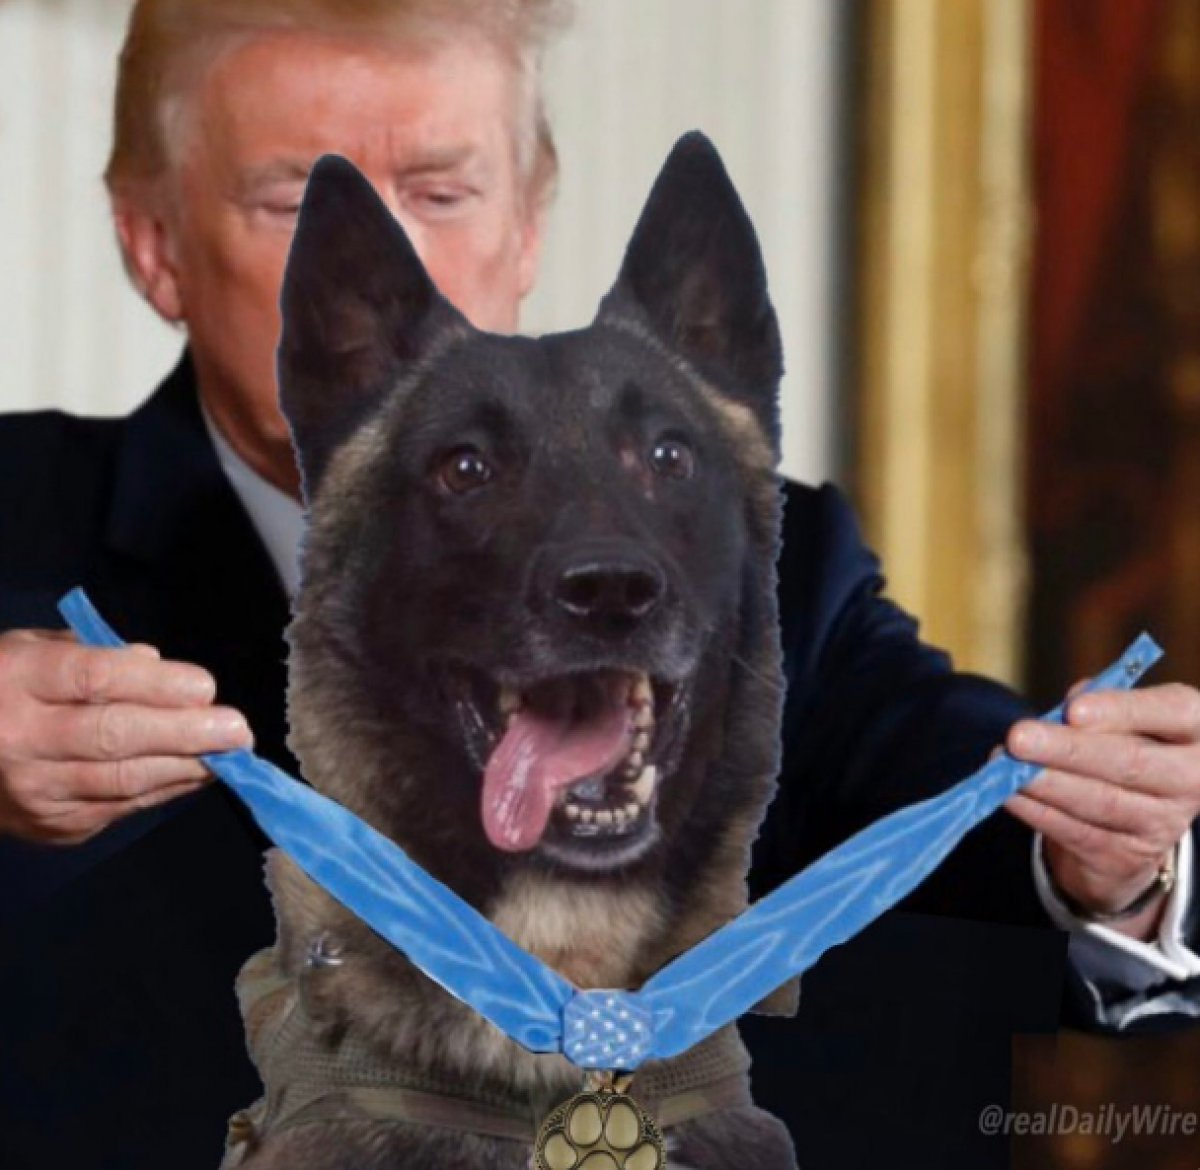 ABD Başkanı Trump'tan montajlı yeni paylaşım